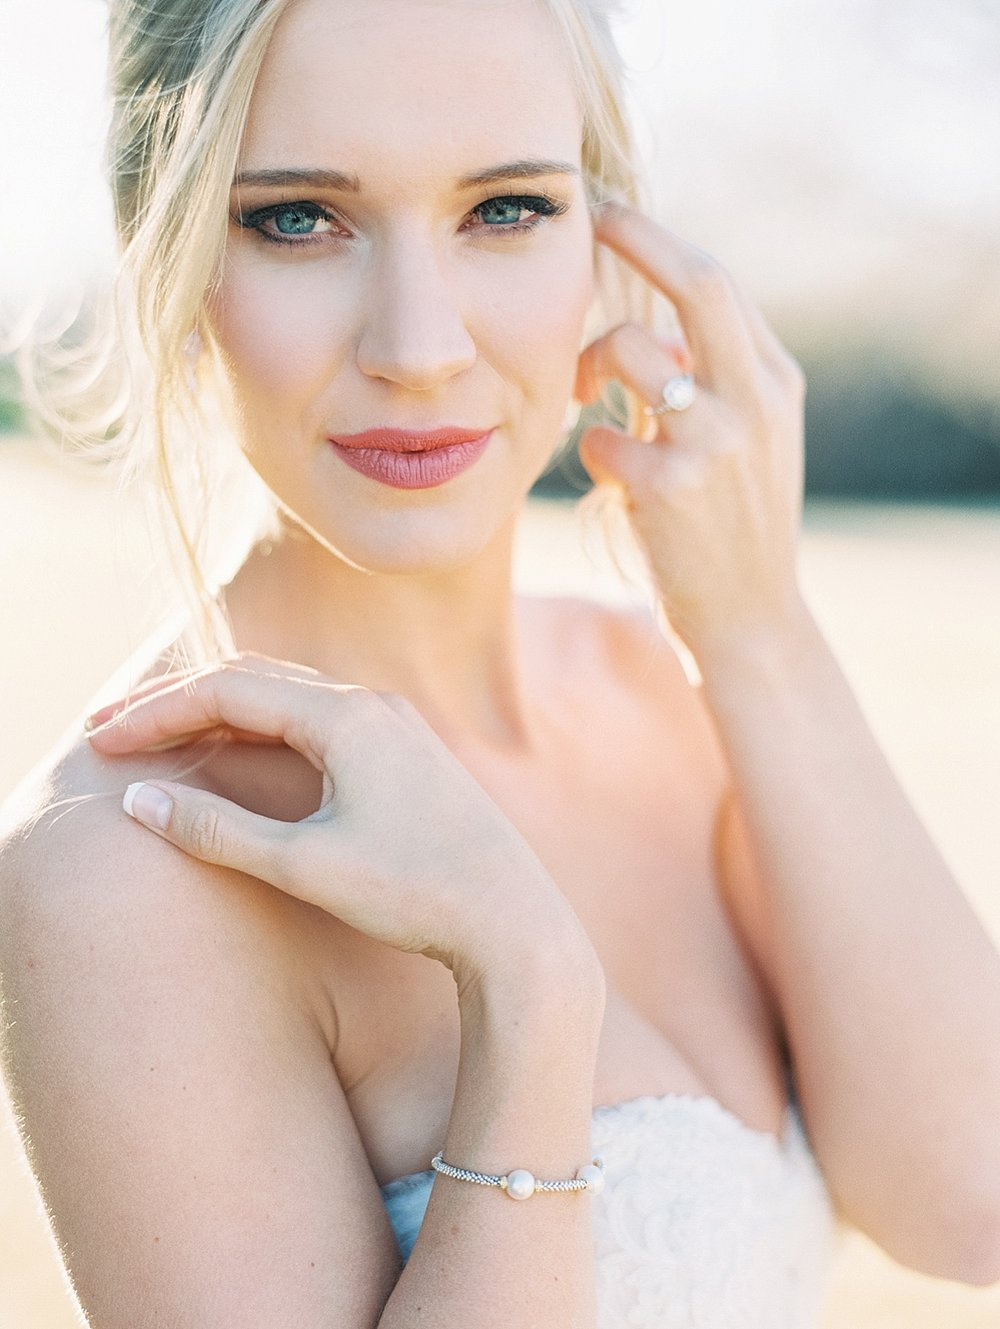 Dallas Bridal Photography | Becca Lea Photography